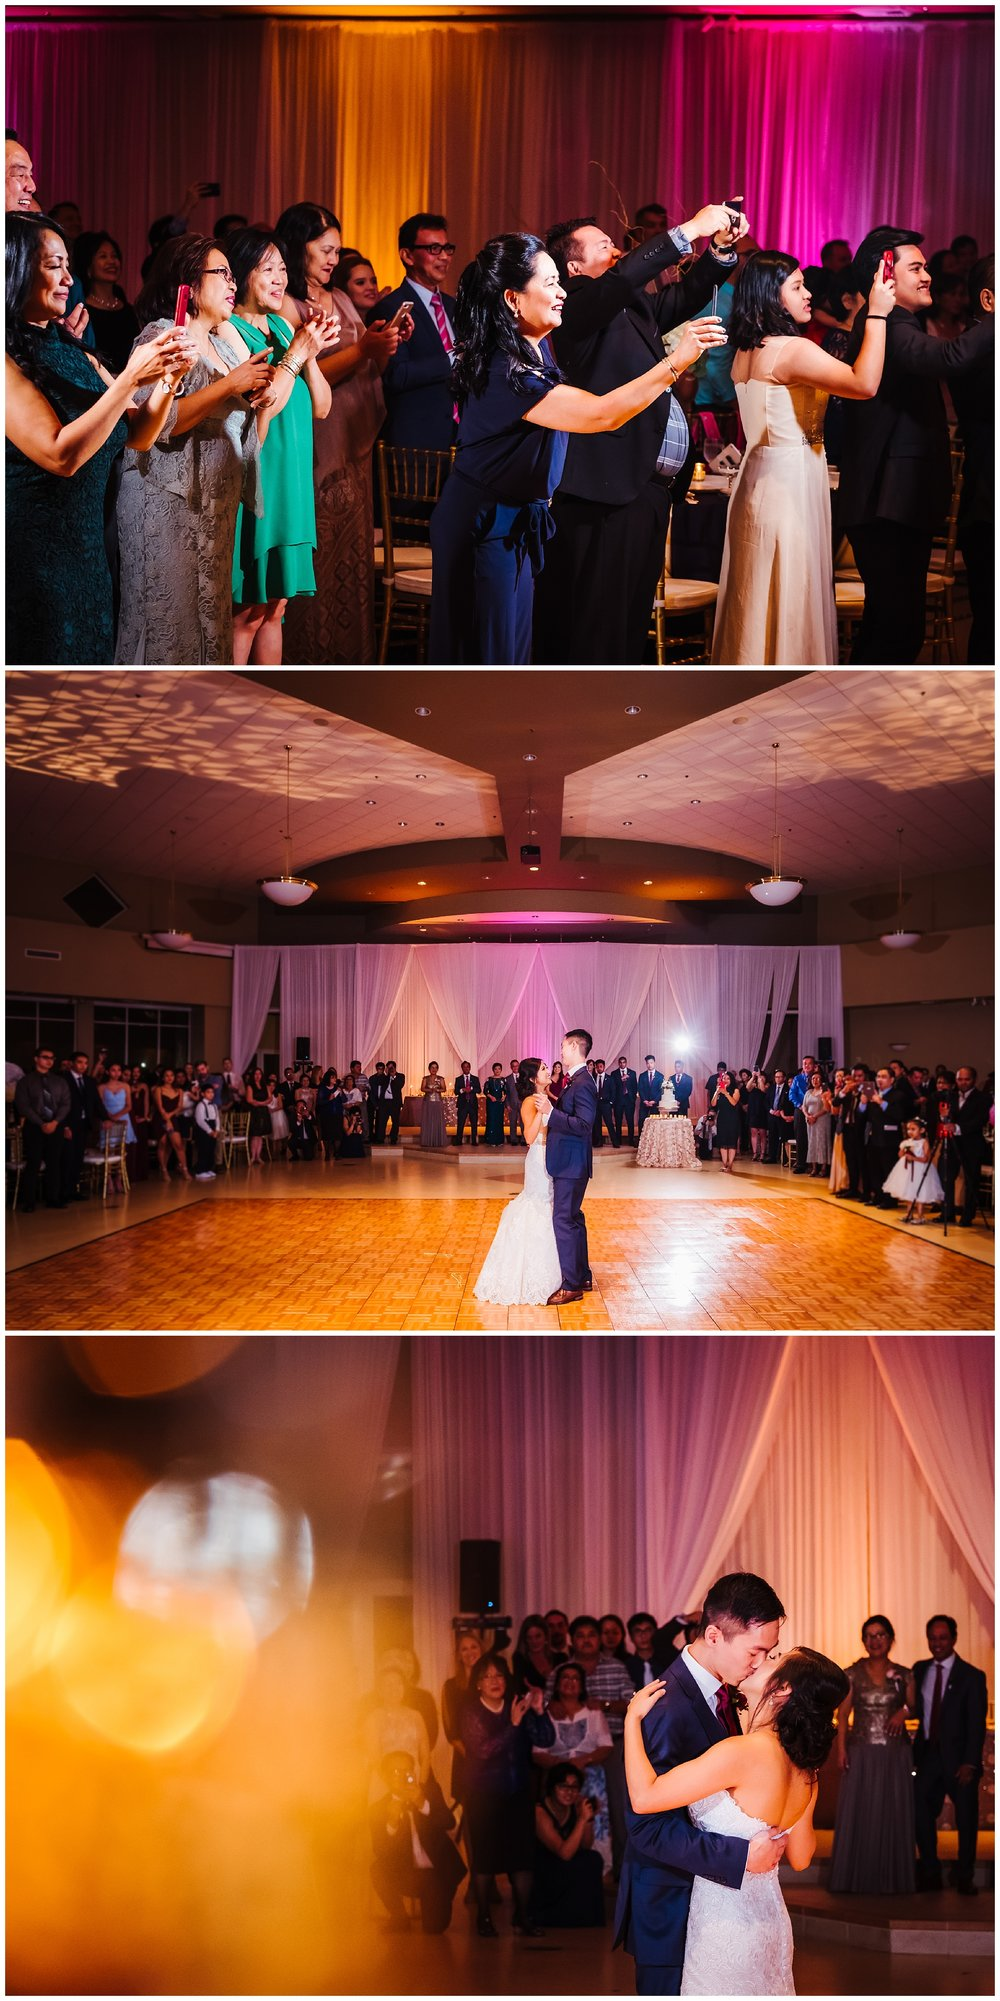 tampa-wedding-photographer-philipino-colorful-woods-ballroom-church-mass-confetti-fuscia_0067.jpg